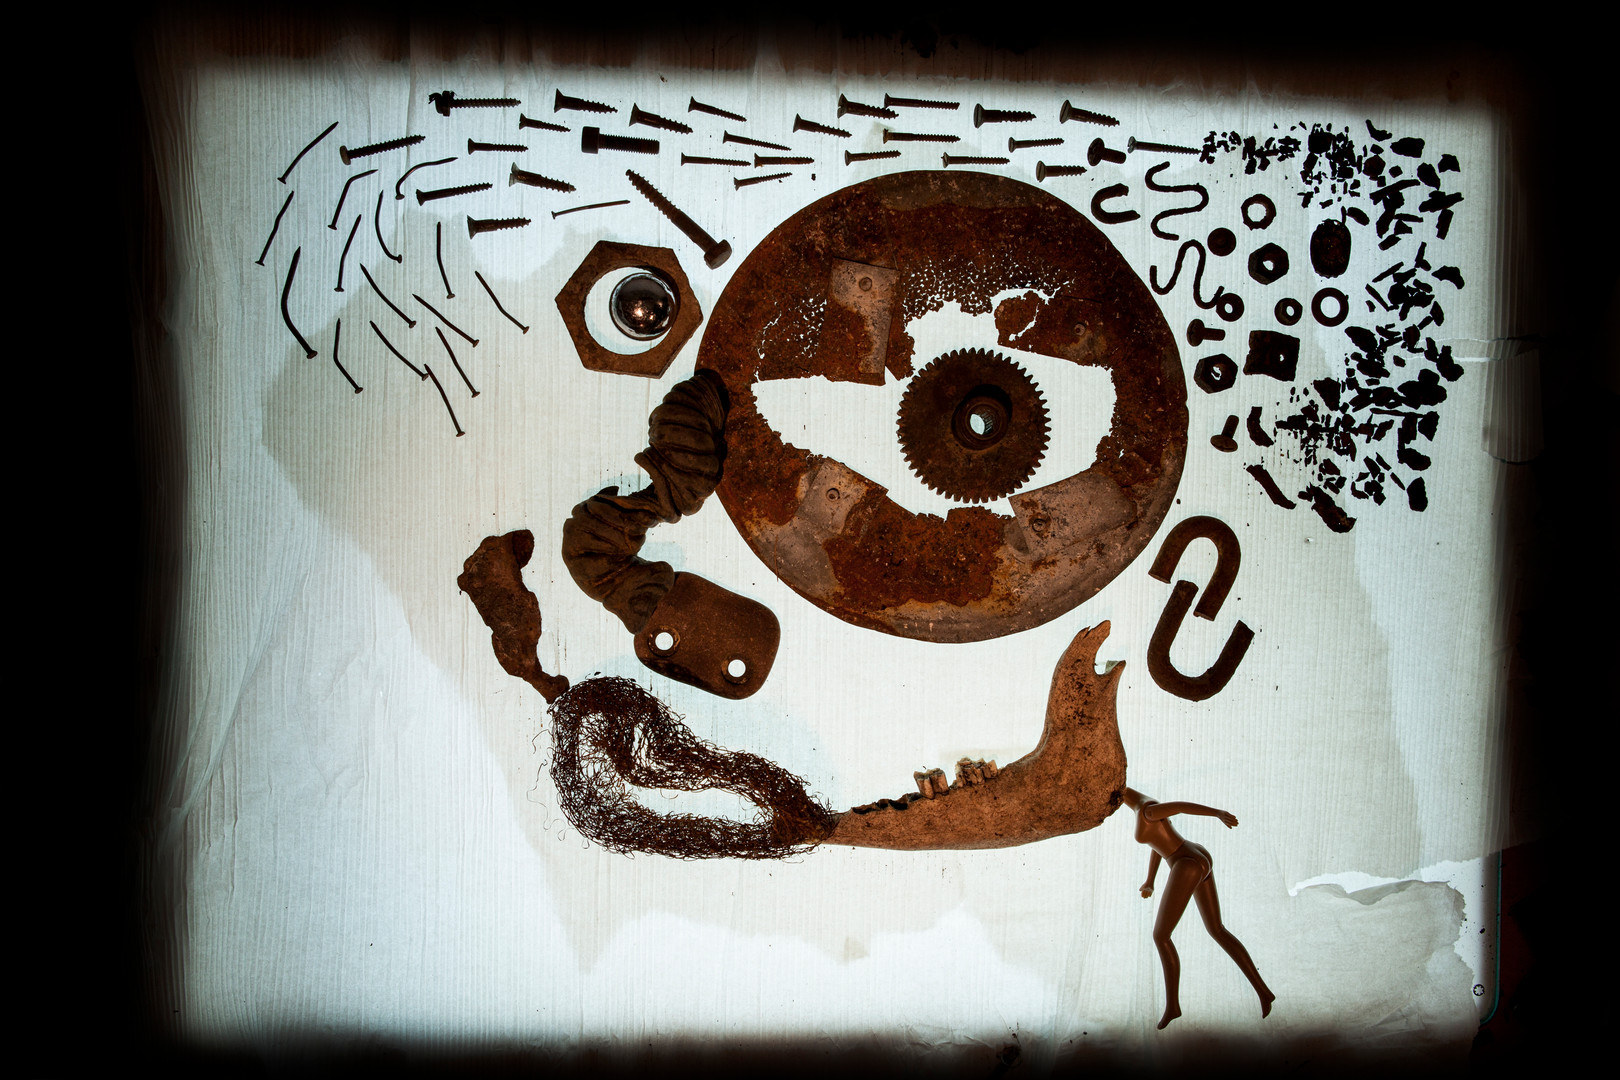 sand & ready made illustration   איור בחול, בחפצים, פרחים, אבנים וכו׳